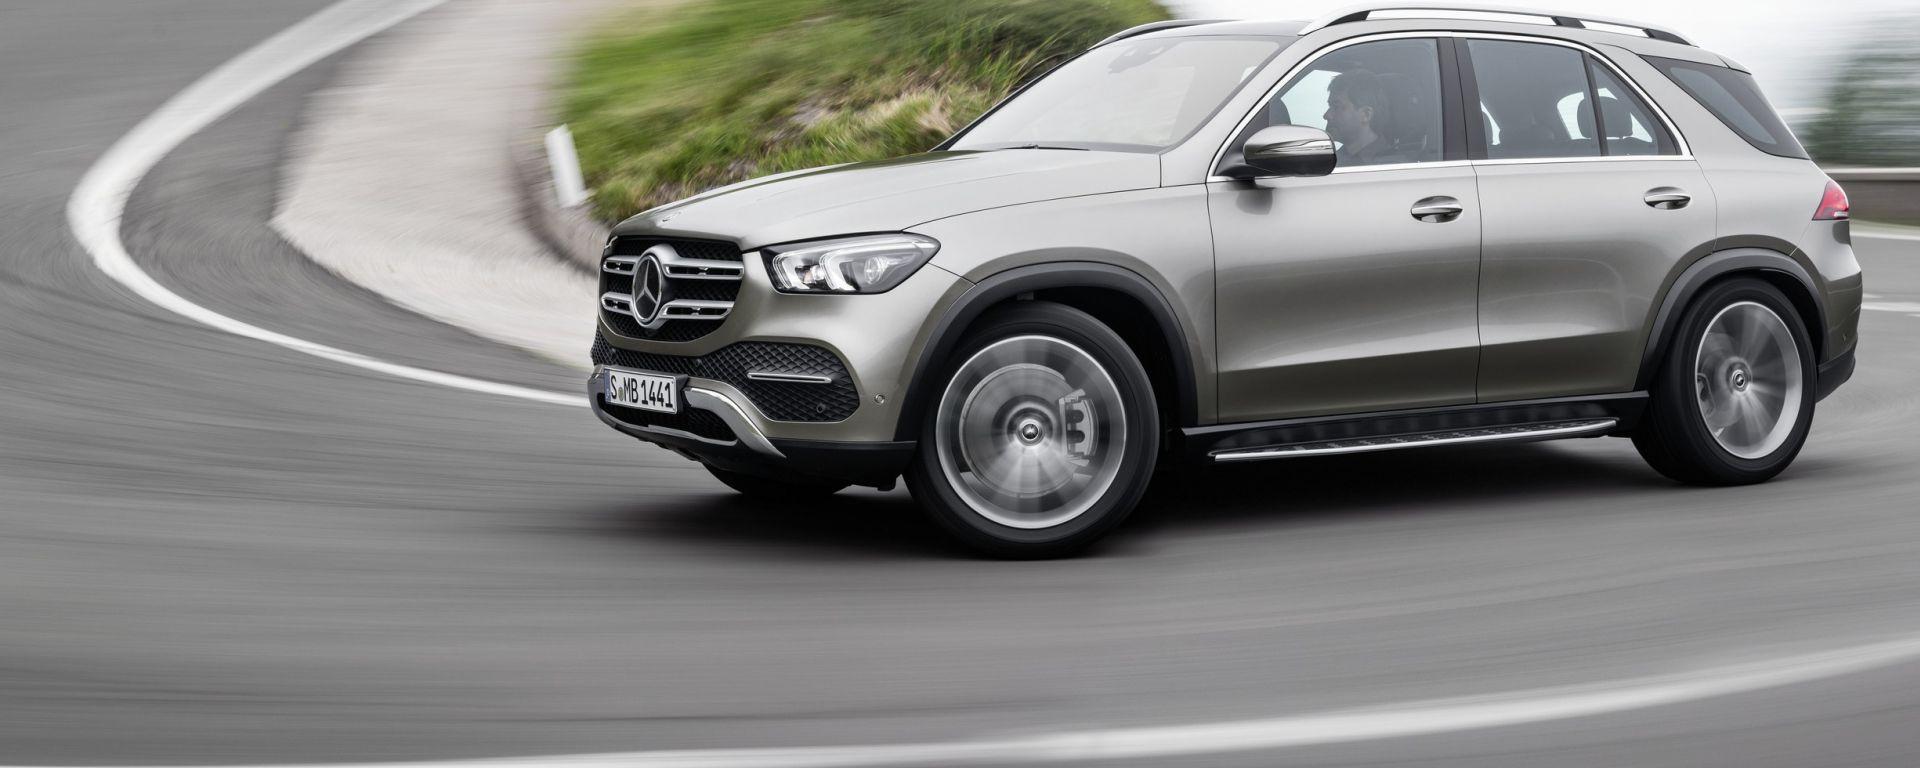 Mercedes-Benz GLE dinamica